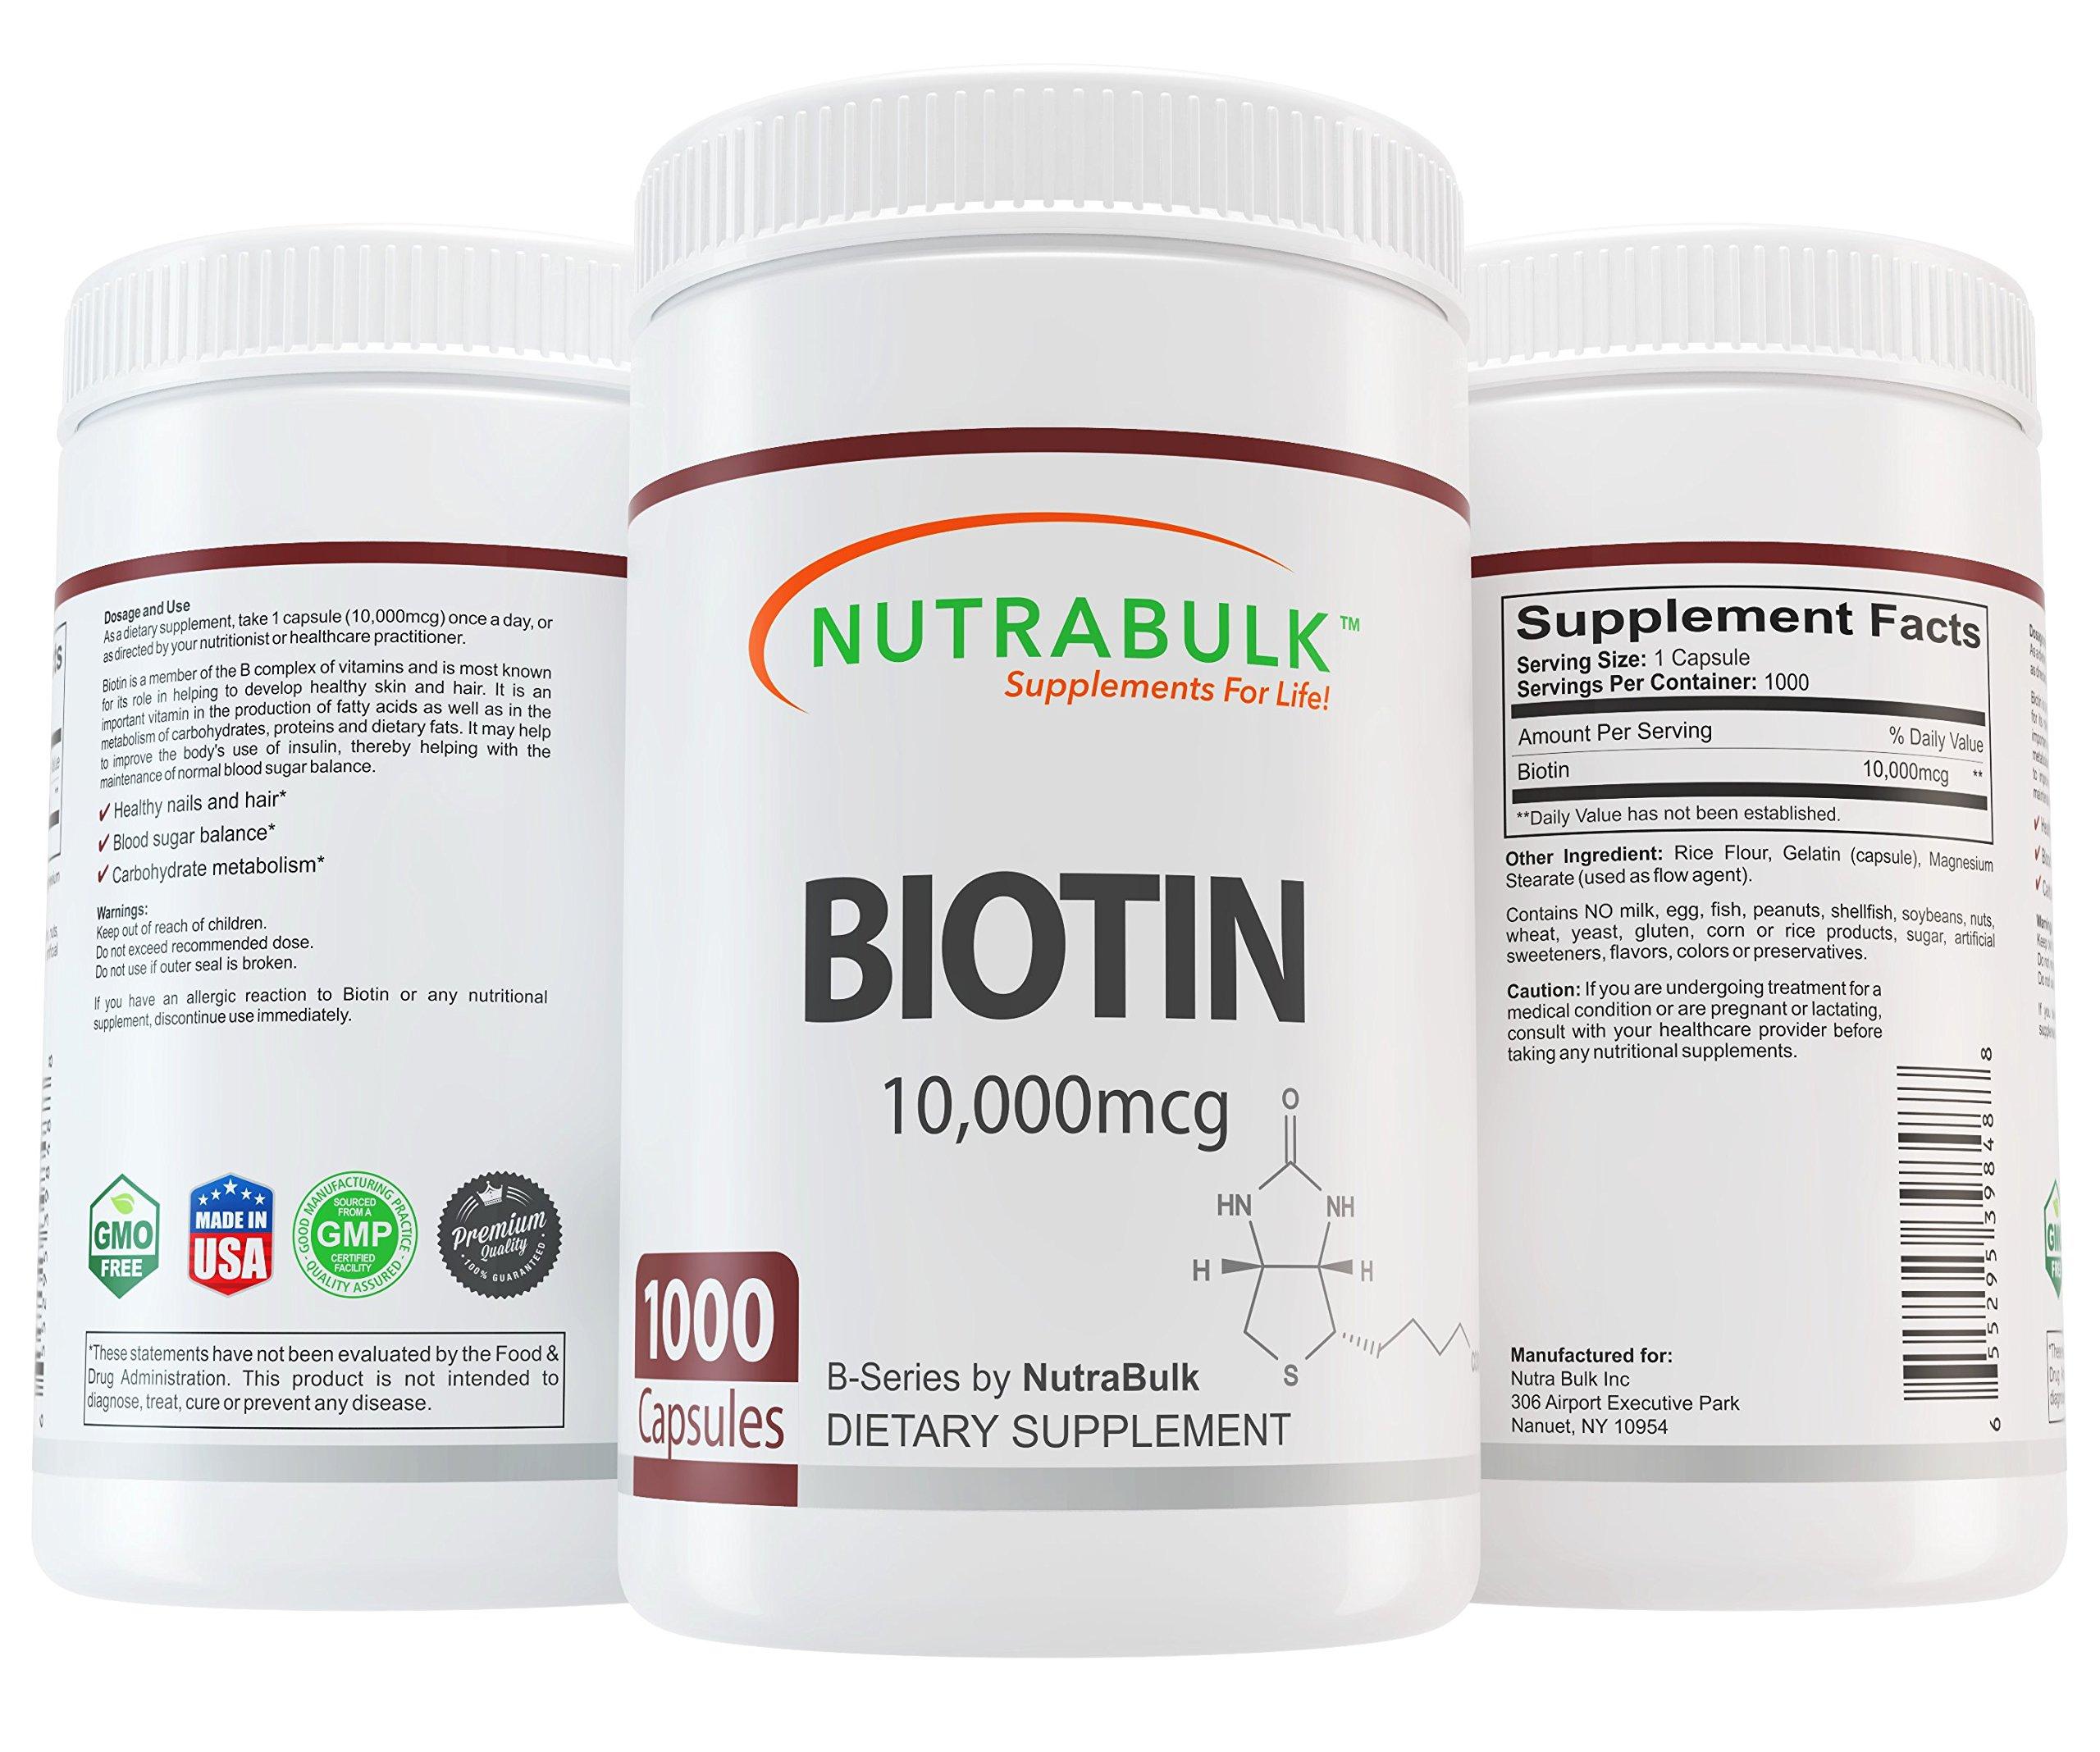 NutraBulk Biotin 10,000 Mcg 1000 Count